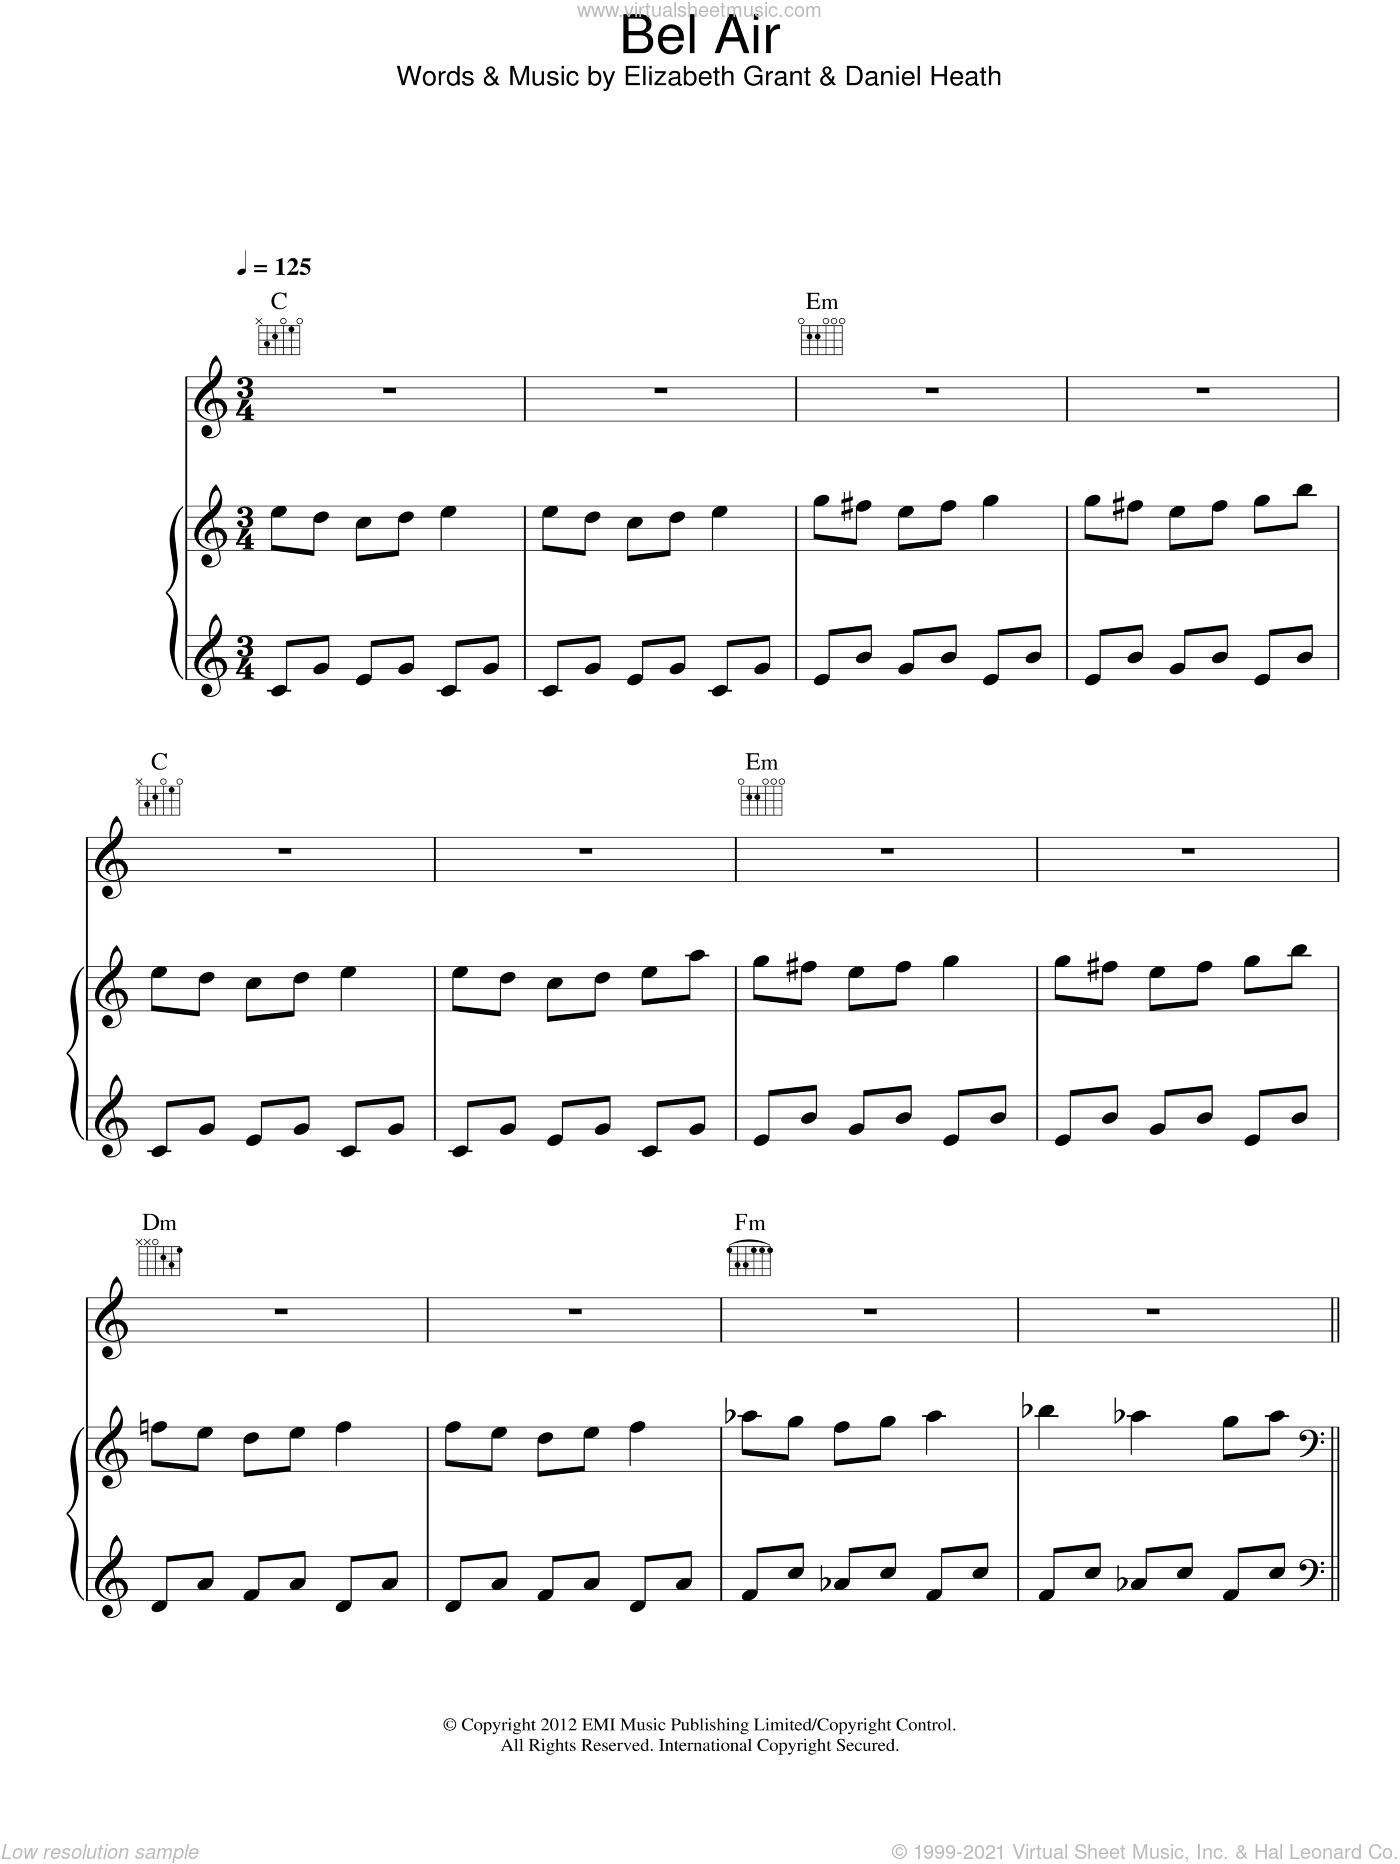 Bel Air sheet music for voice, piano or guitar by Lana Del Rey, Daniel Heath and Elizabeth Grant, intermediate skill level